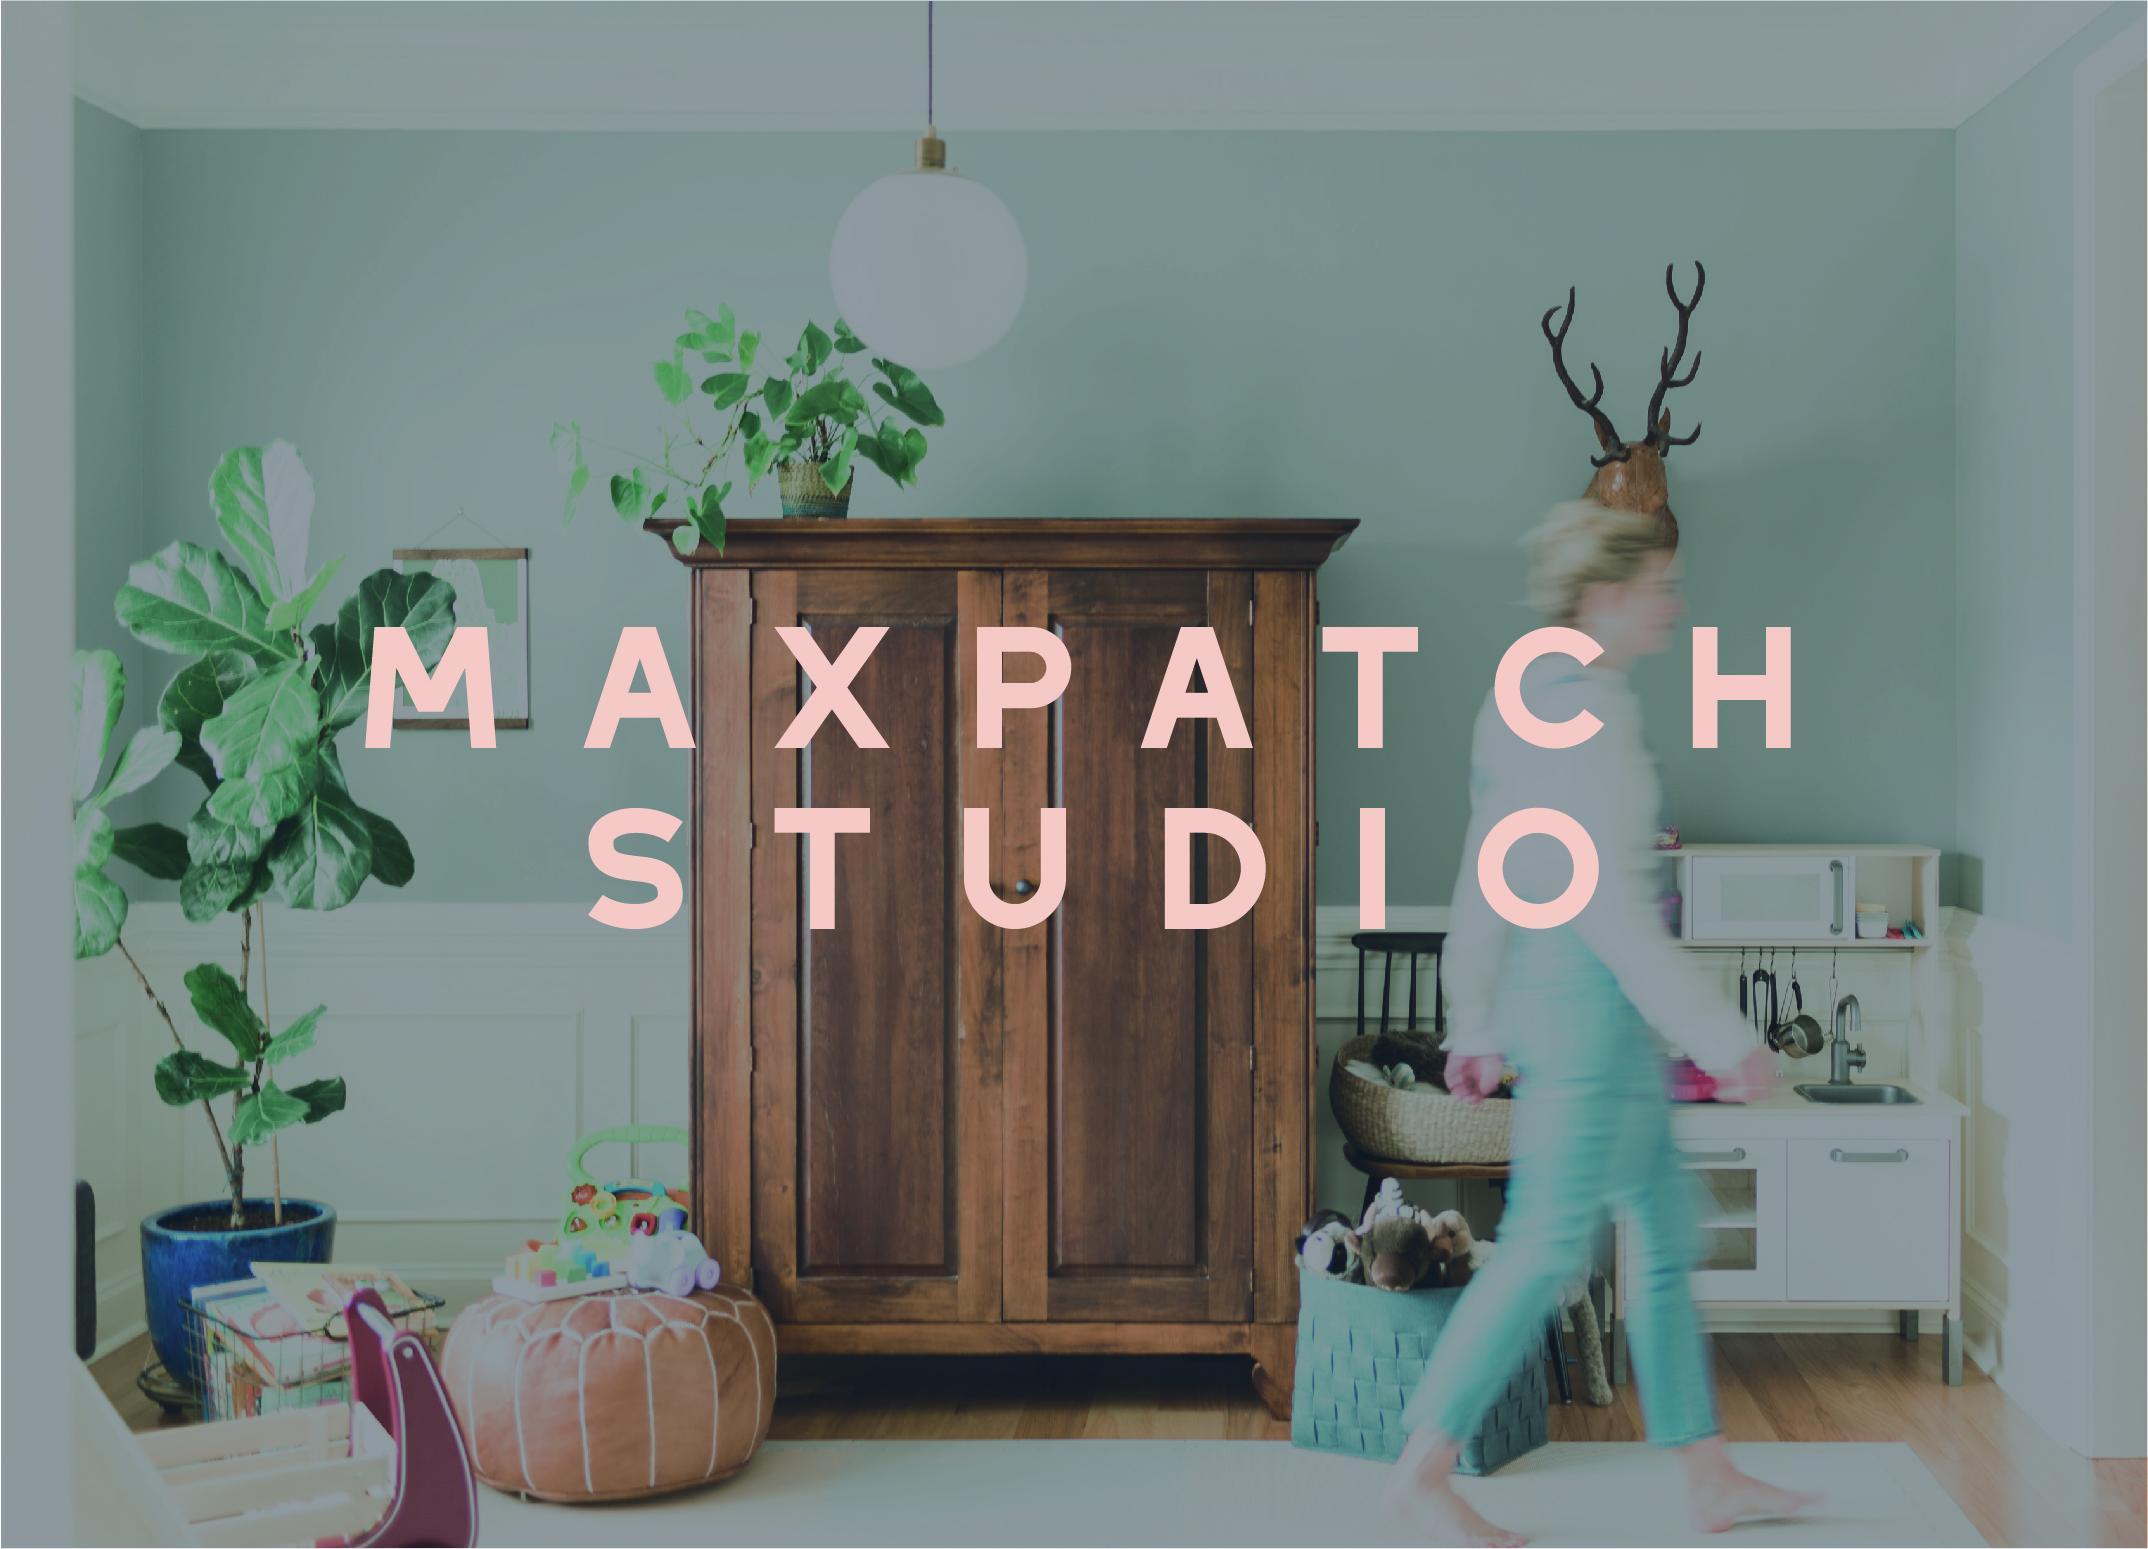 maxpatch studio_1.jpg